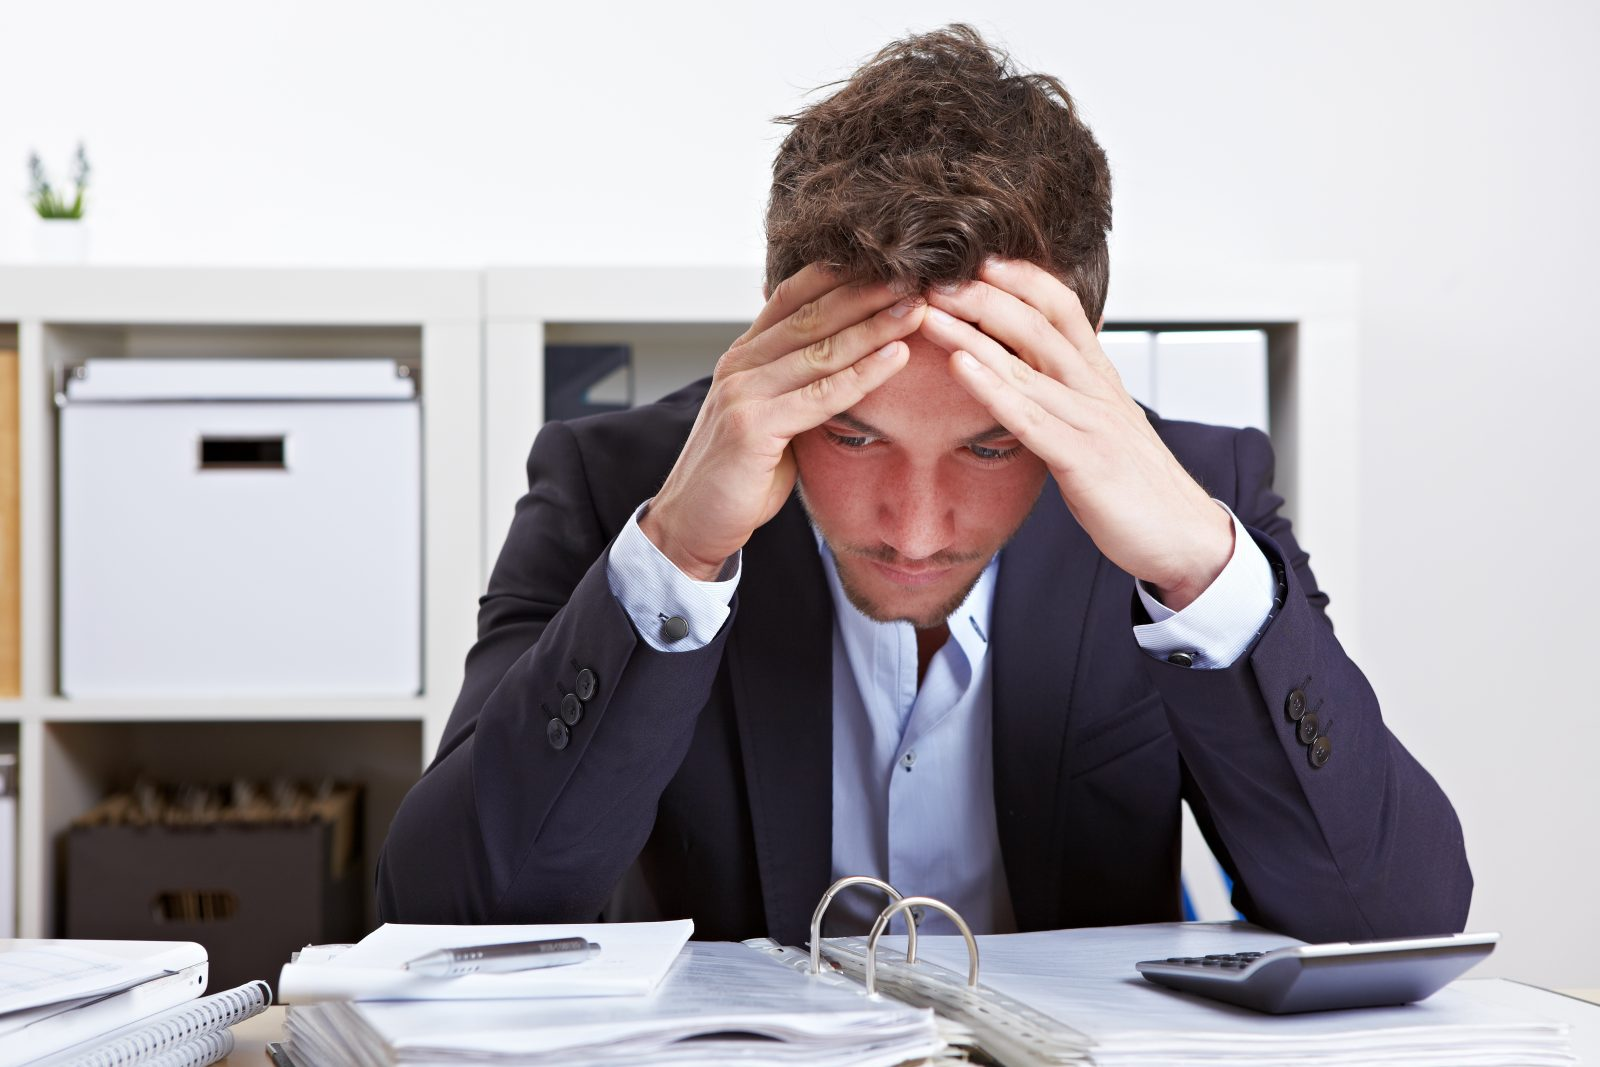 Программа коррекции синдрома хронической усталости (синдрома менеджера)